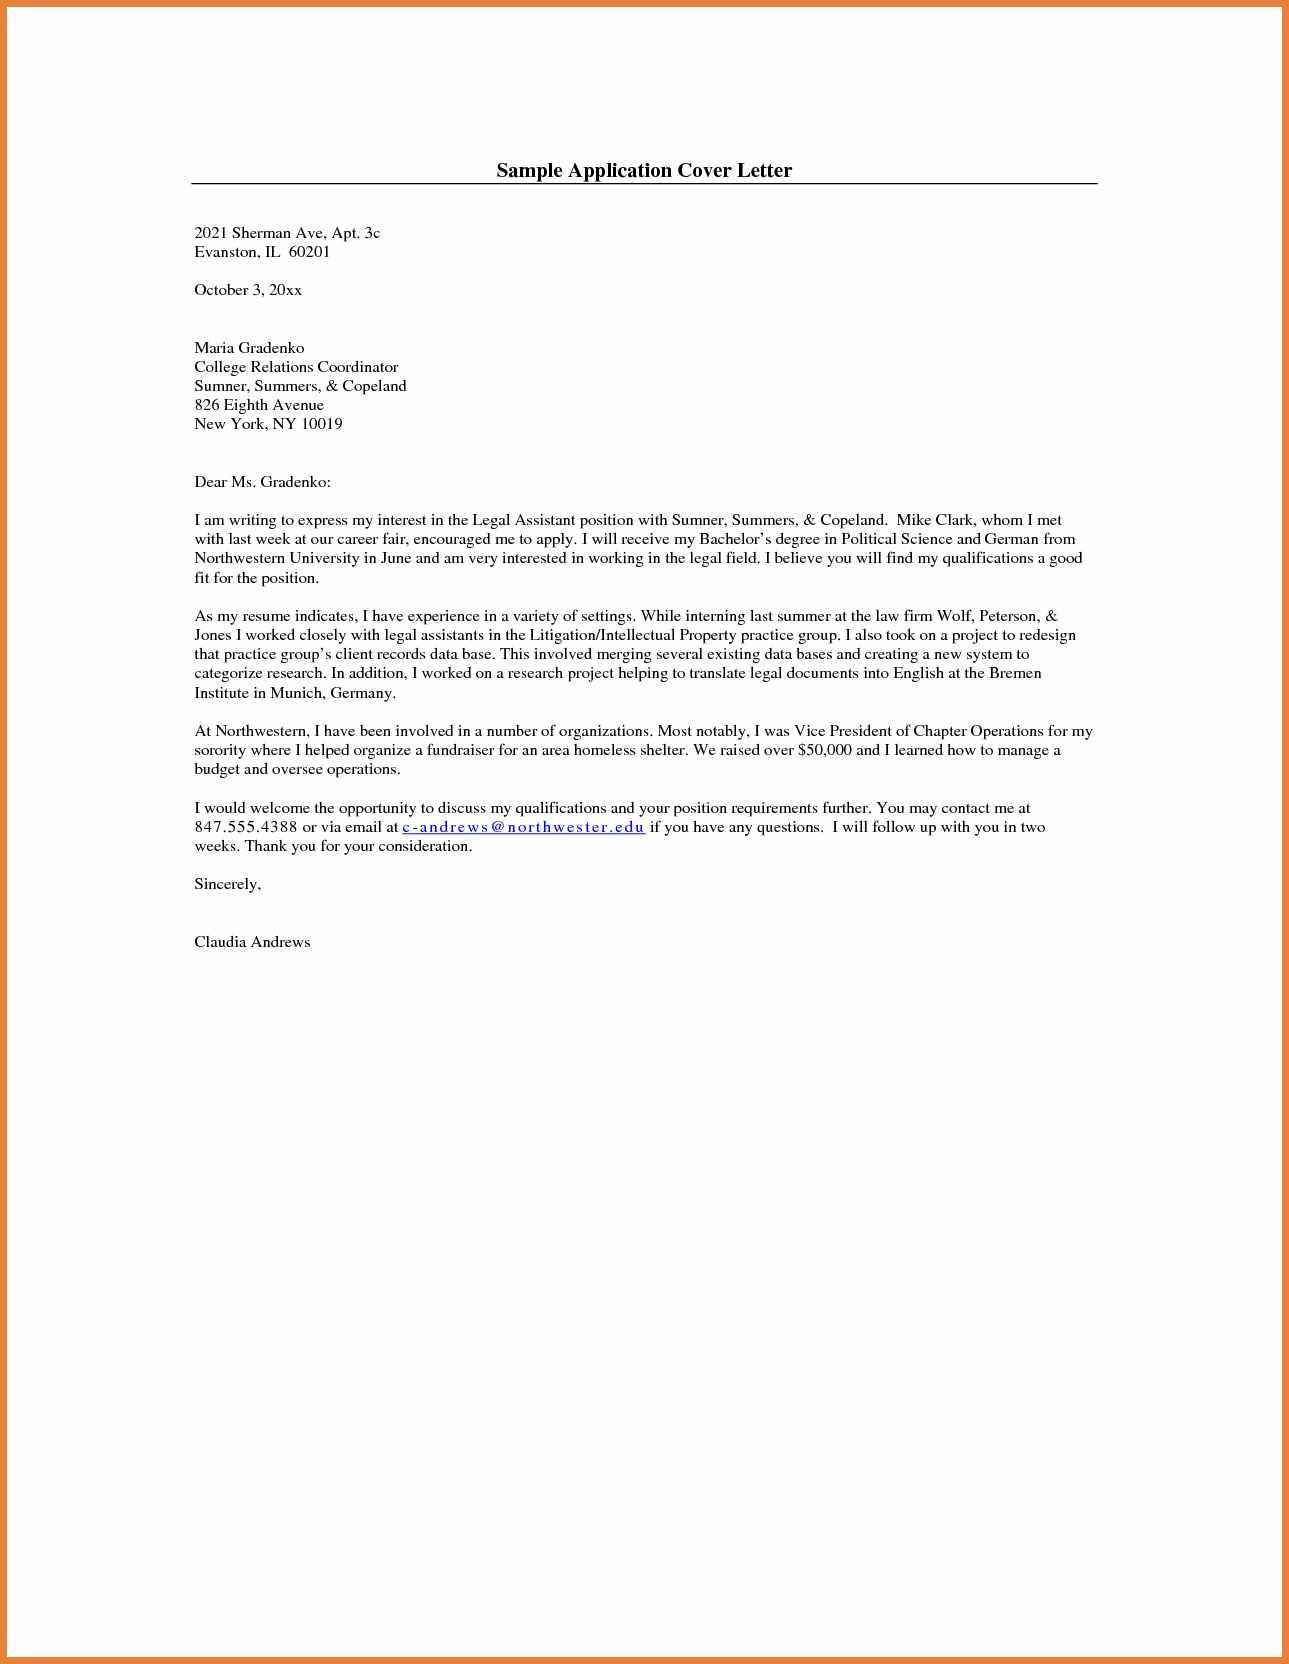 Inquiry Letter For Business Cover Letter Application Sop  Bu Tarz Benim  Pinterest  Creative .